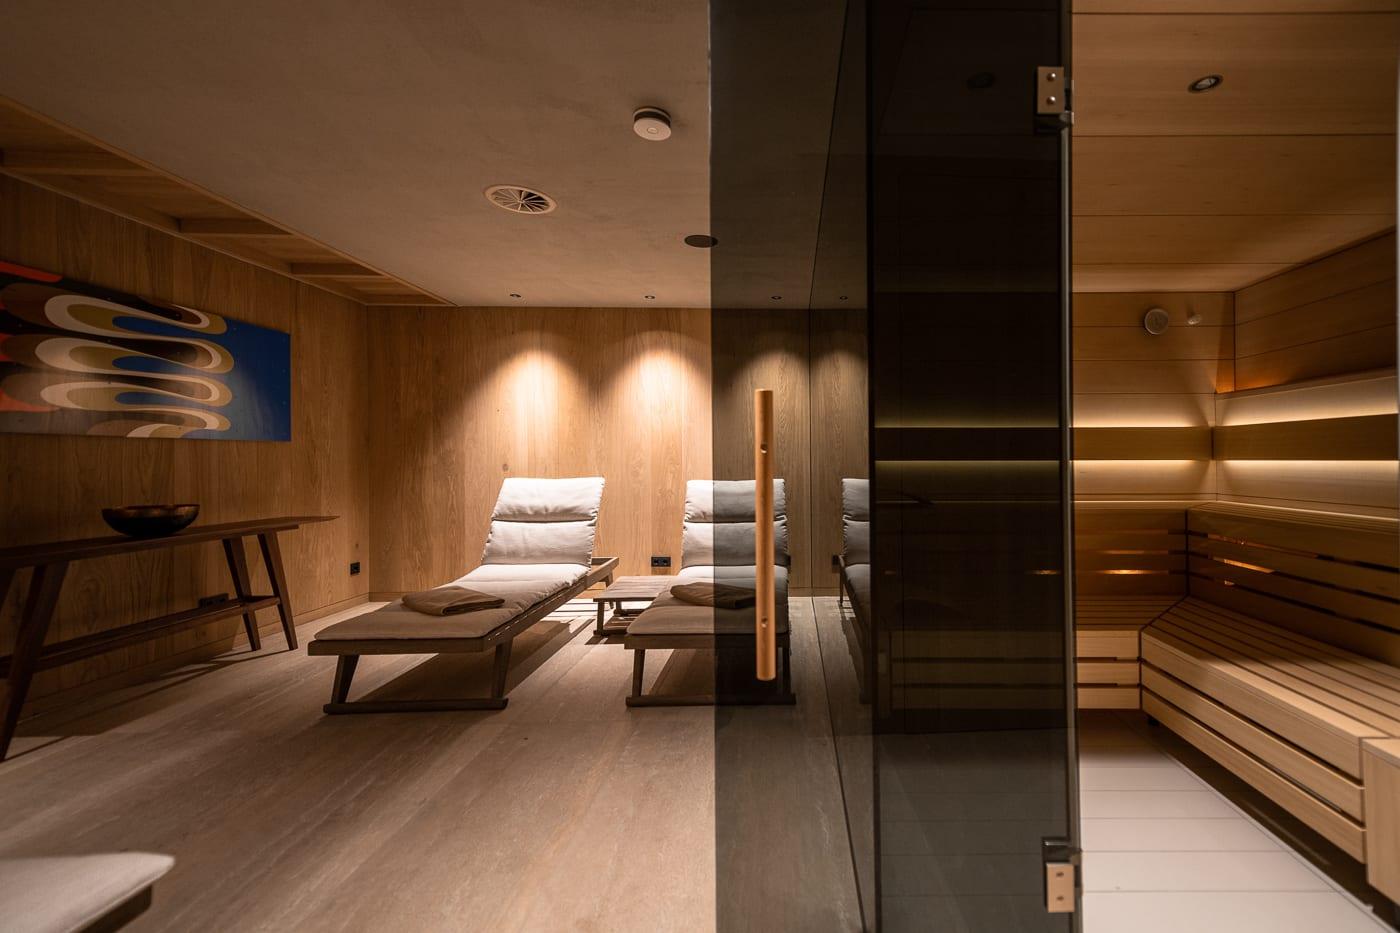 arla-luxury-home-lech-174